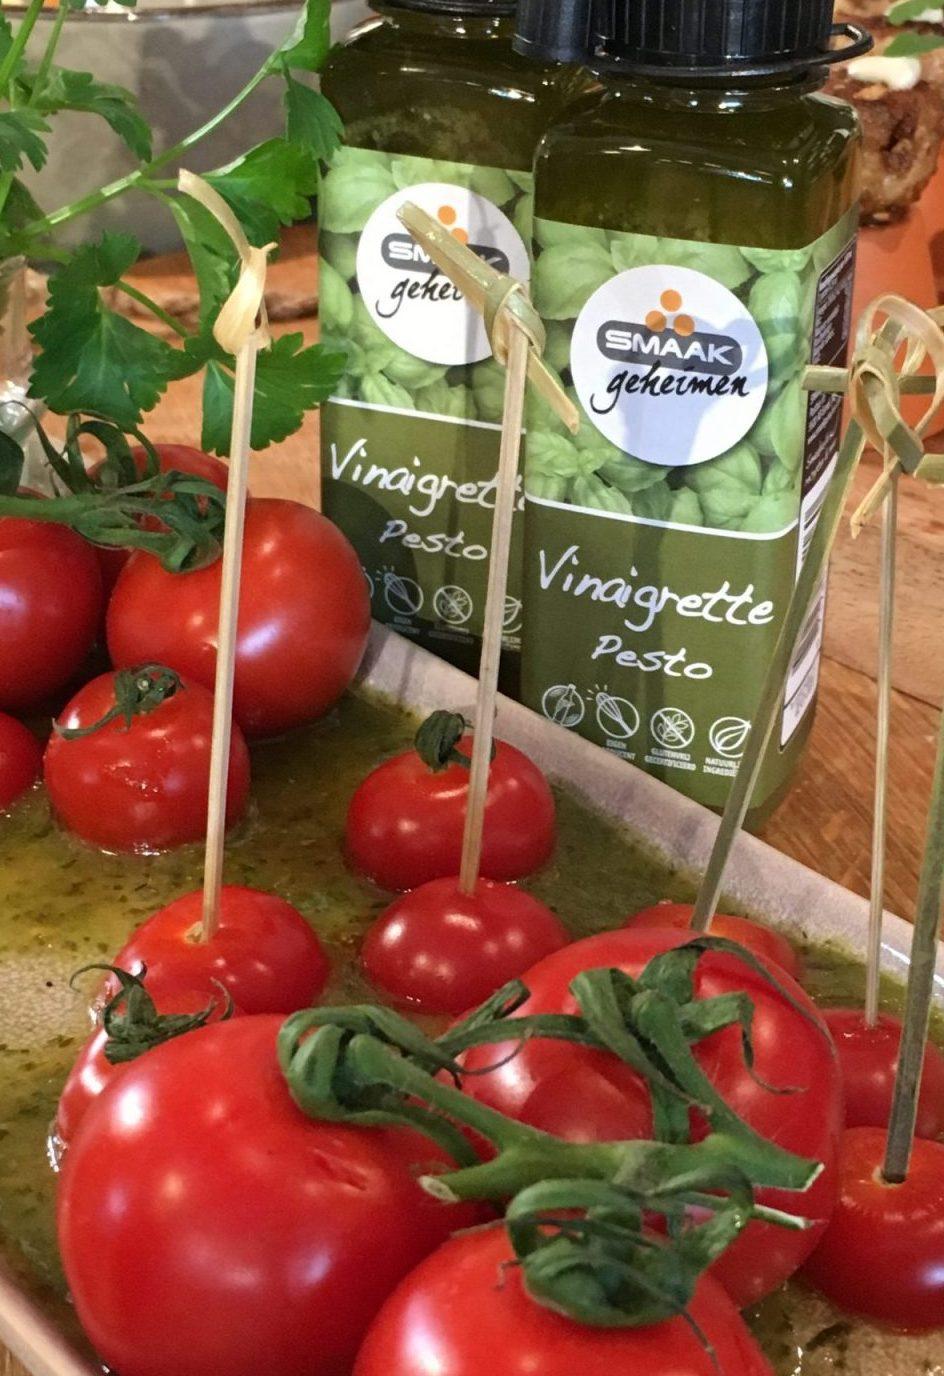 Tomaten bonbon Smaakgeheimen